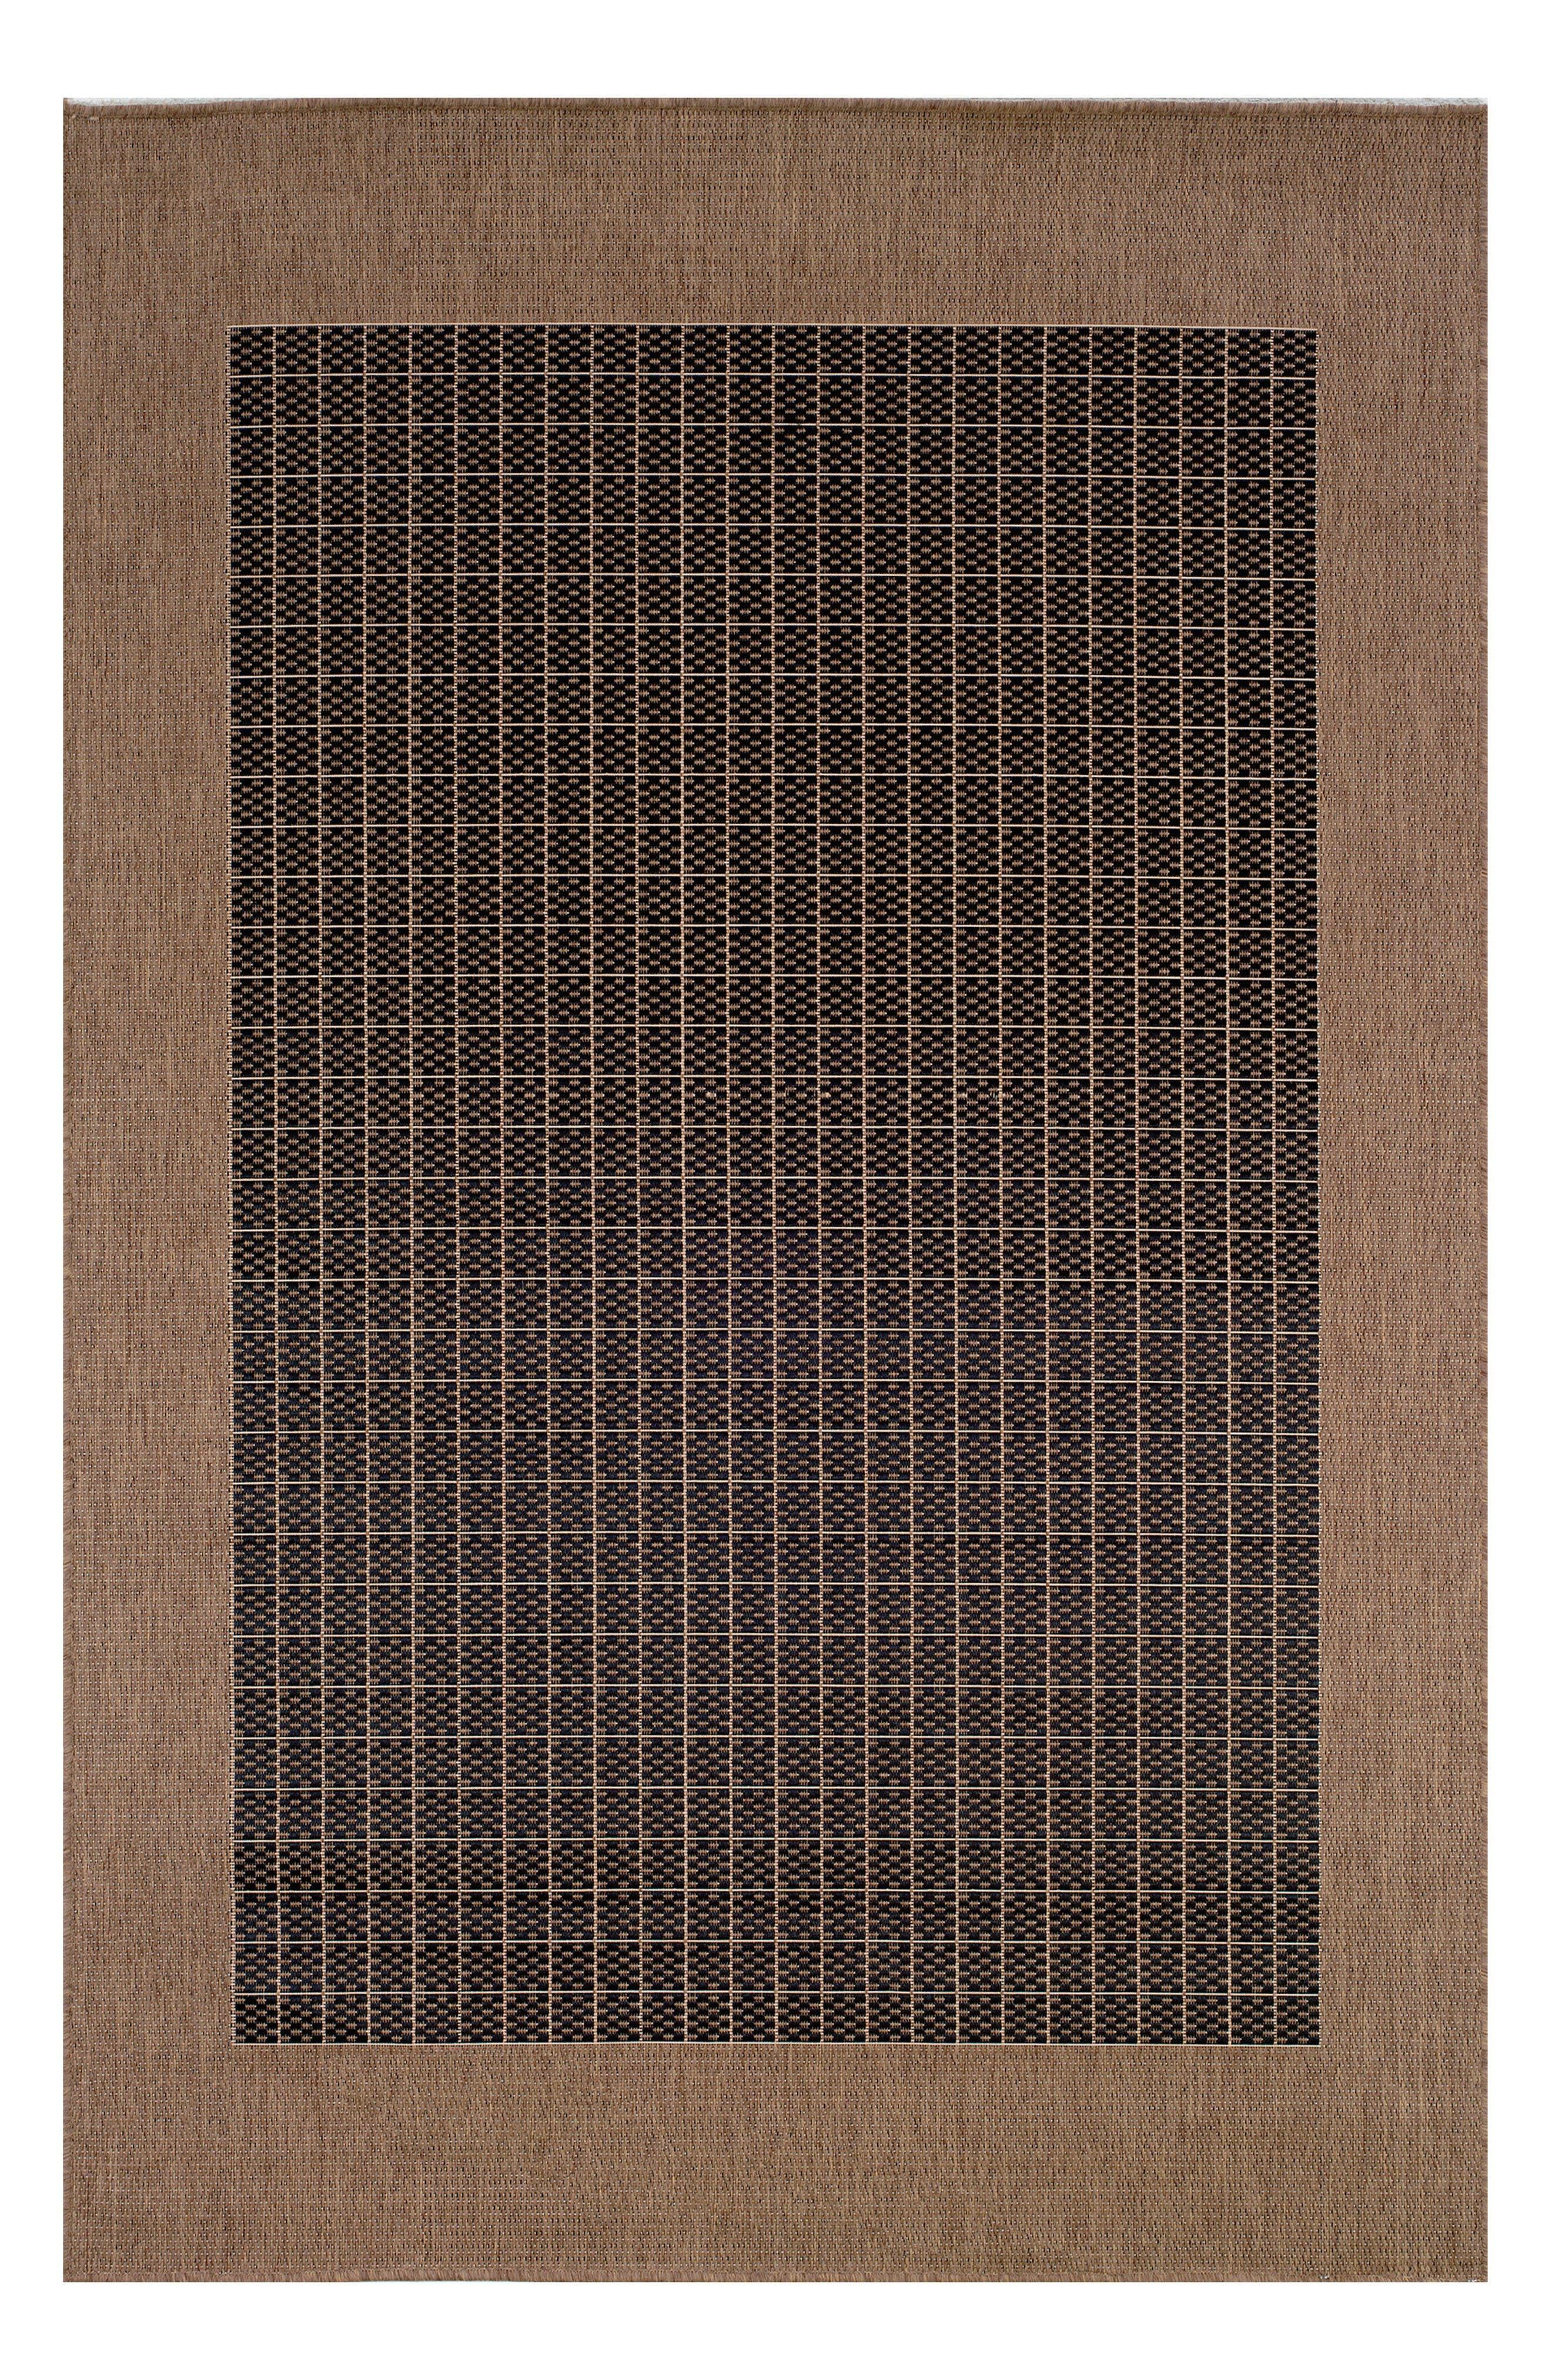 Main Image - Couristan Checkered Field Indoor/Outdoor Rug